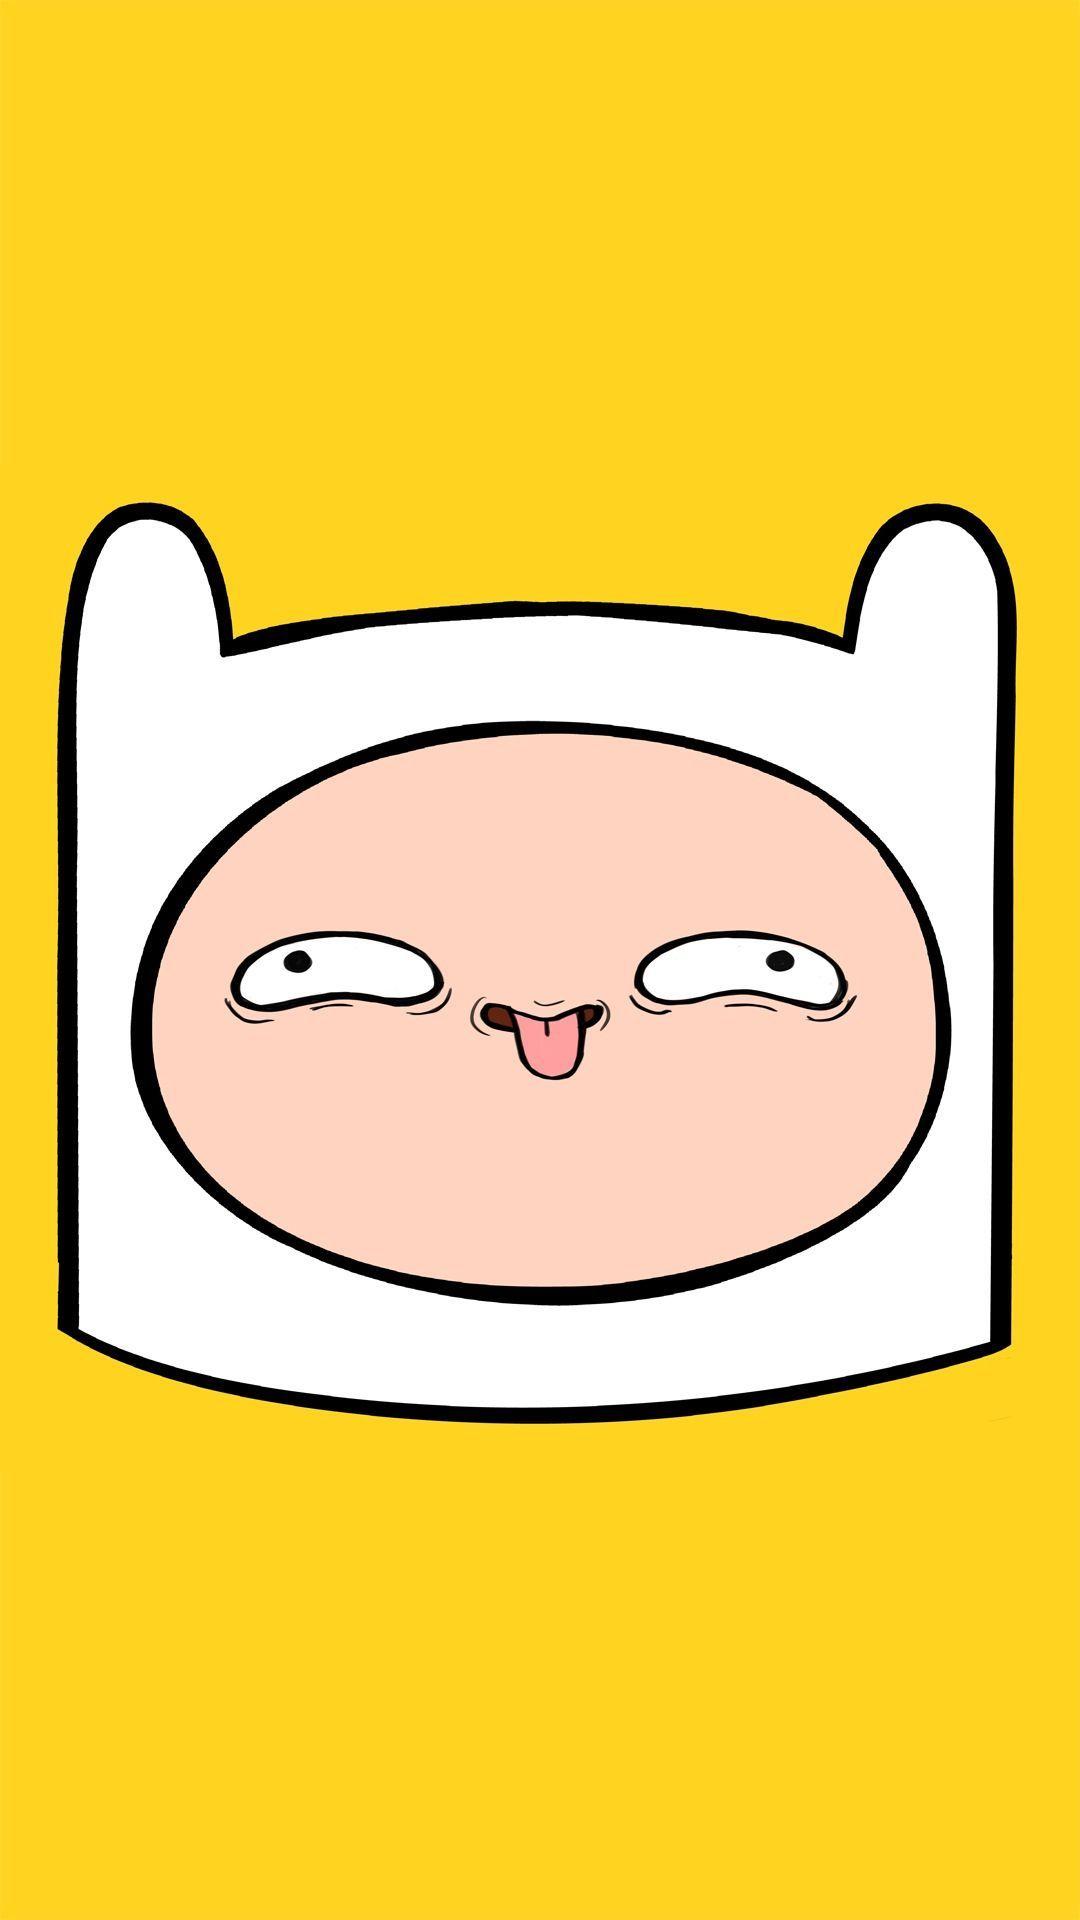 Finn And Jake Adventure Time Wallpaper Hd Em 2020 Adventure Time Papel De Parede Hora De Aventura Jake Tempo De Aventura